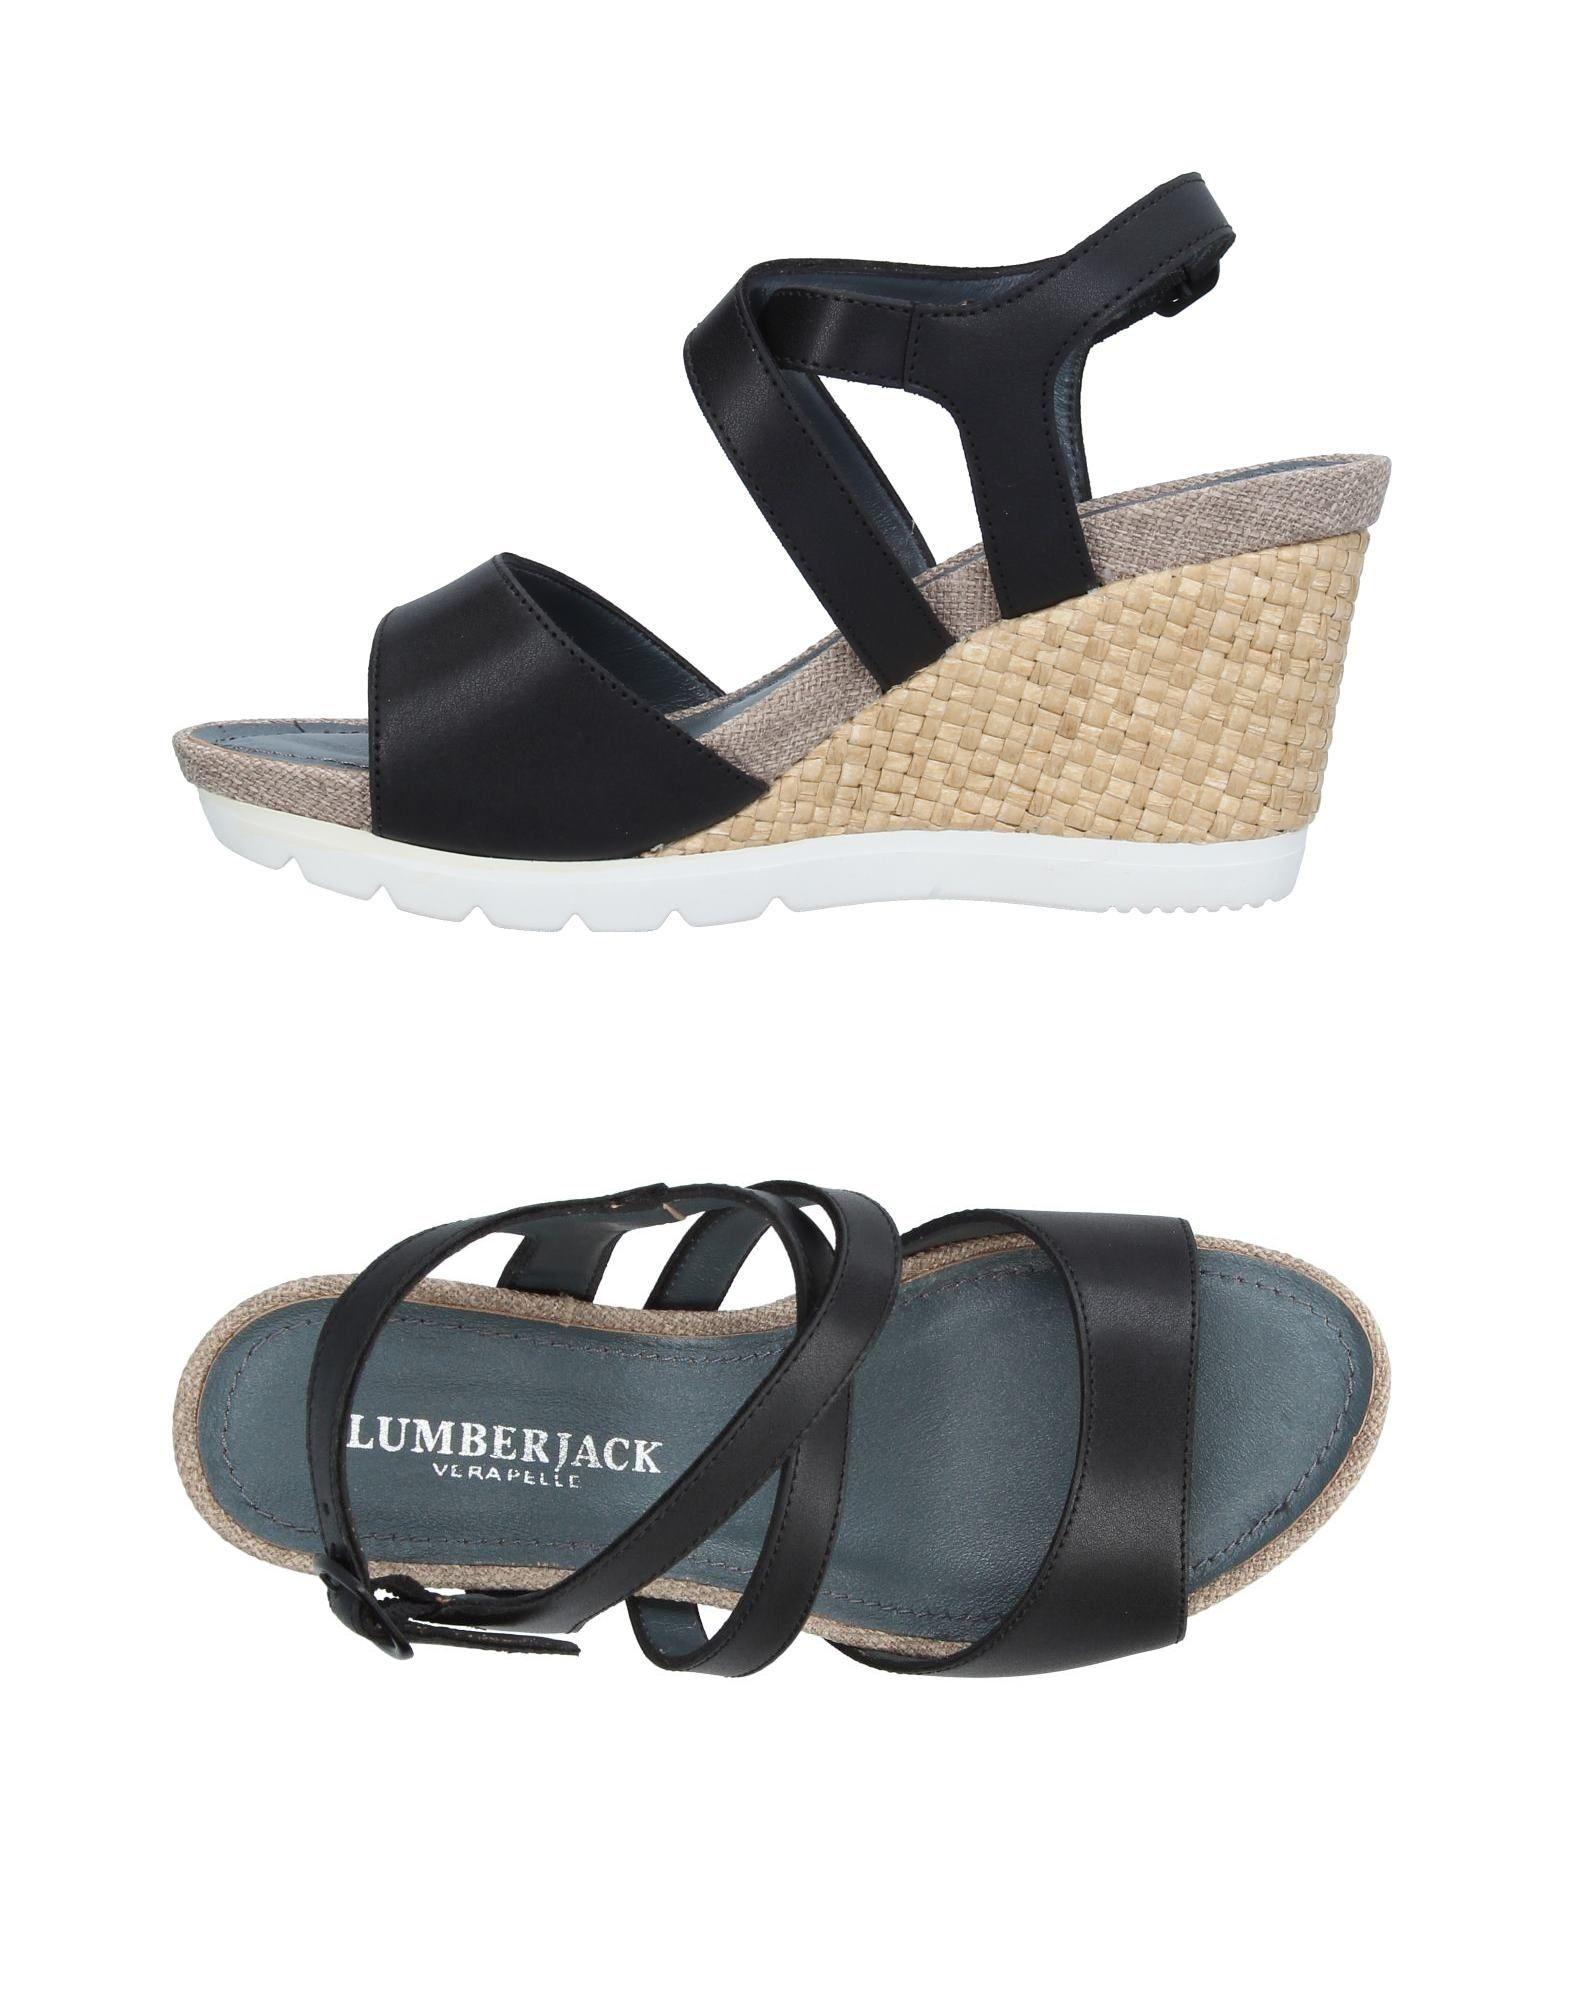 ebeabd02bd86db Lumberjack Sandals - Women Lumberjack Sandals online on YOOX United States  - 11342064PF